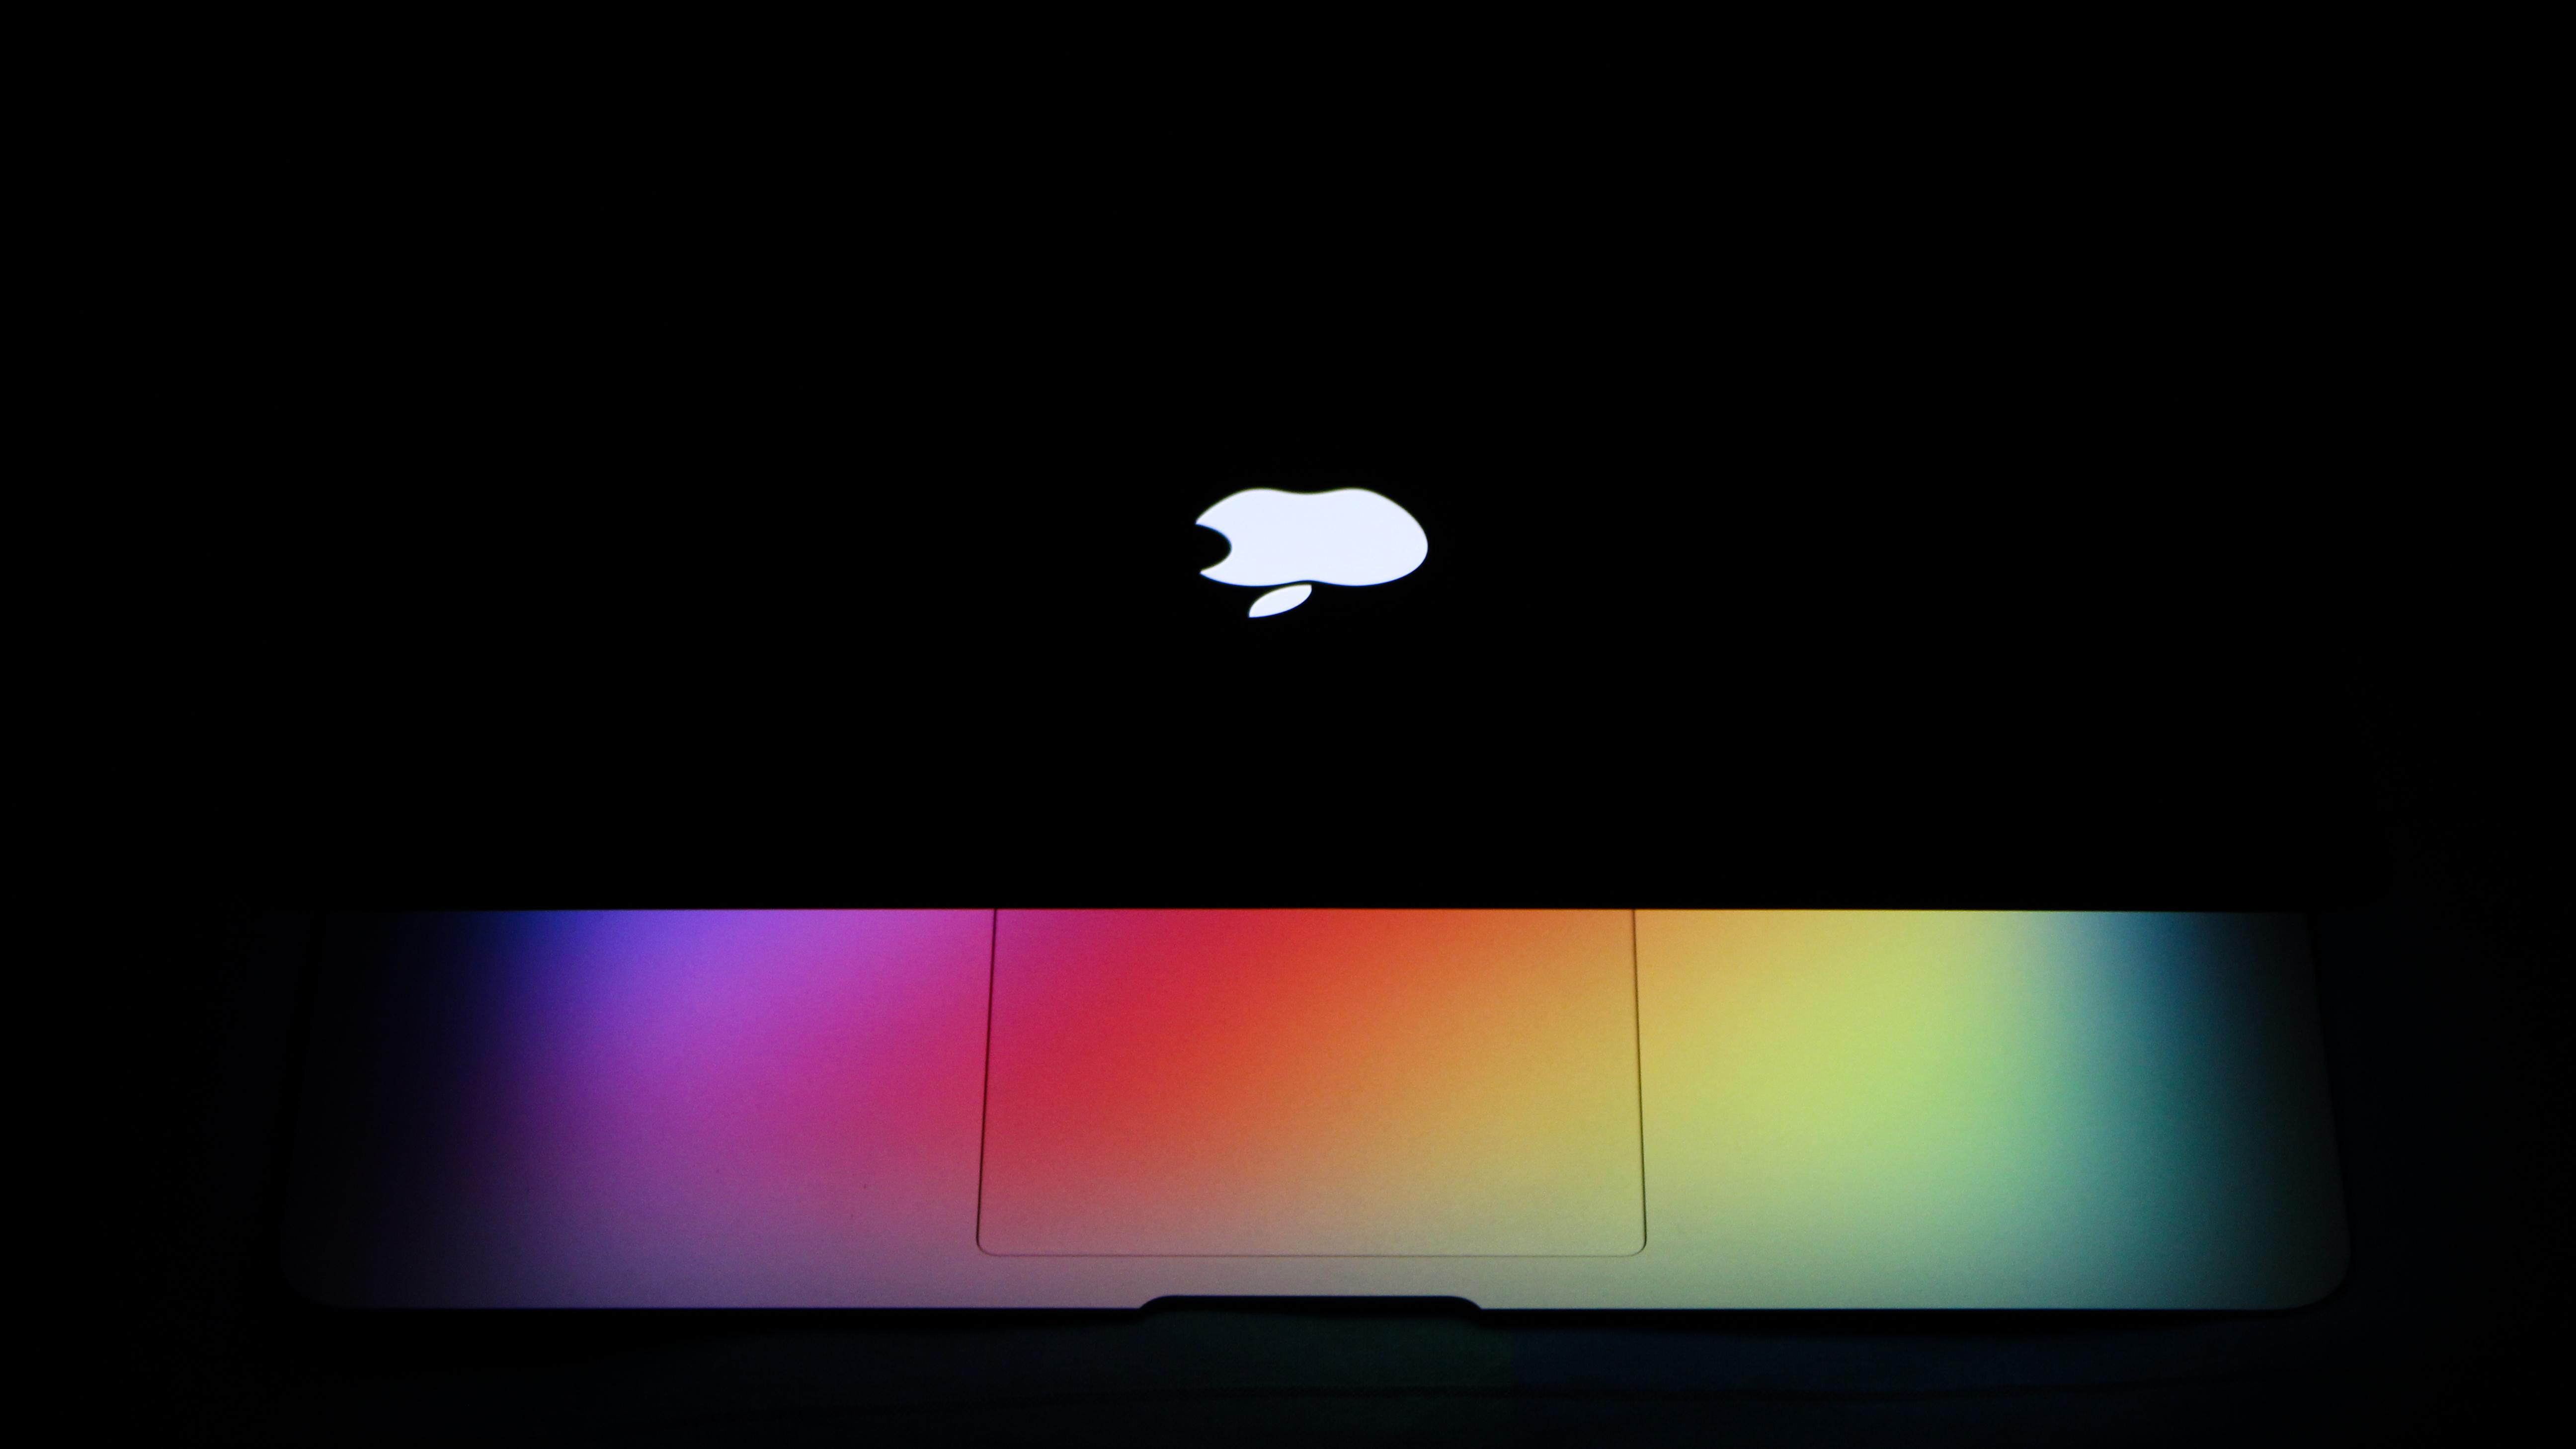 Photograph of Laptop In Dark Area